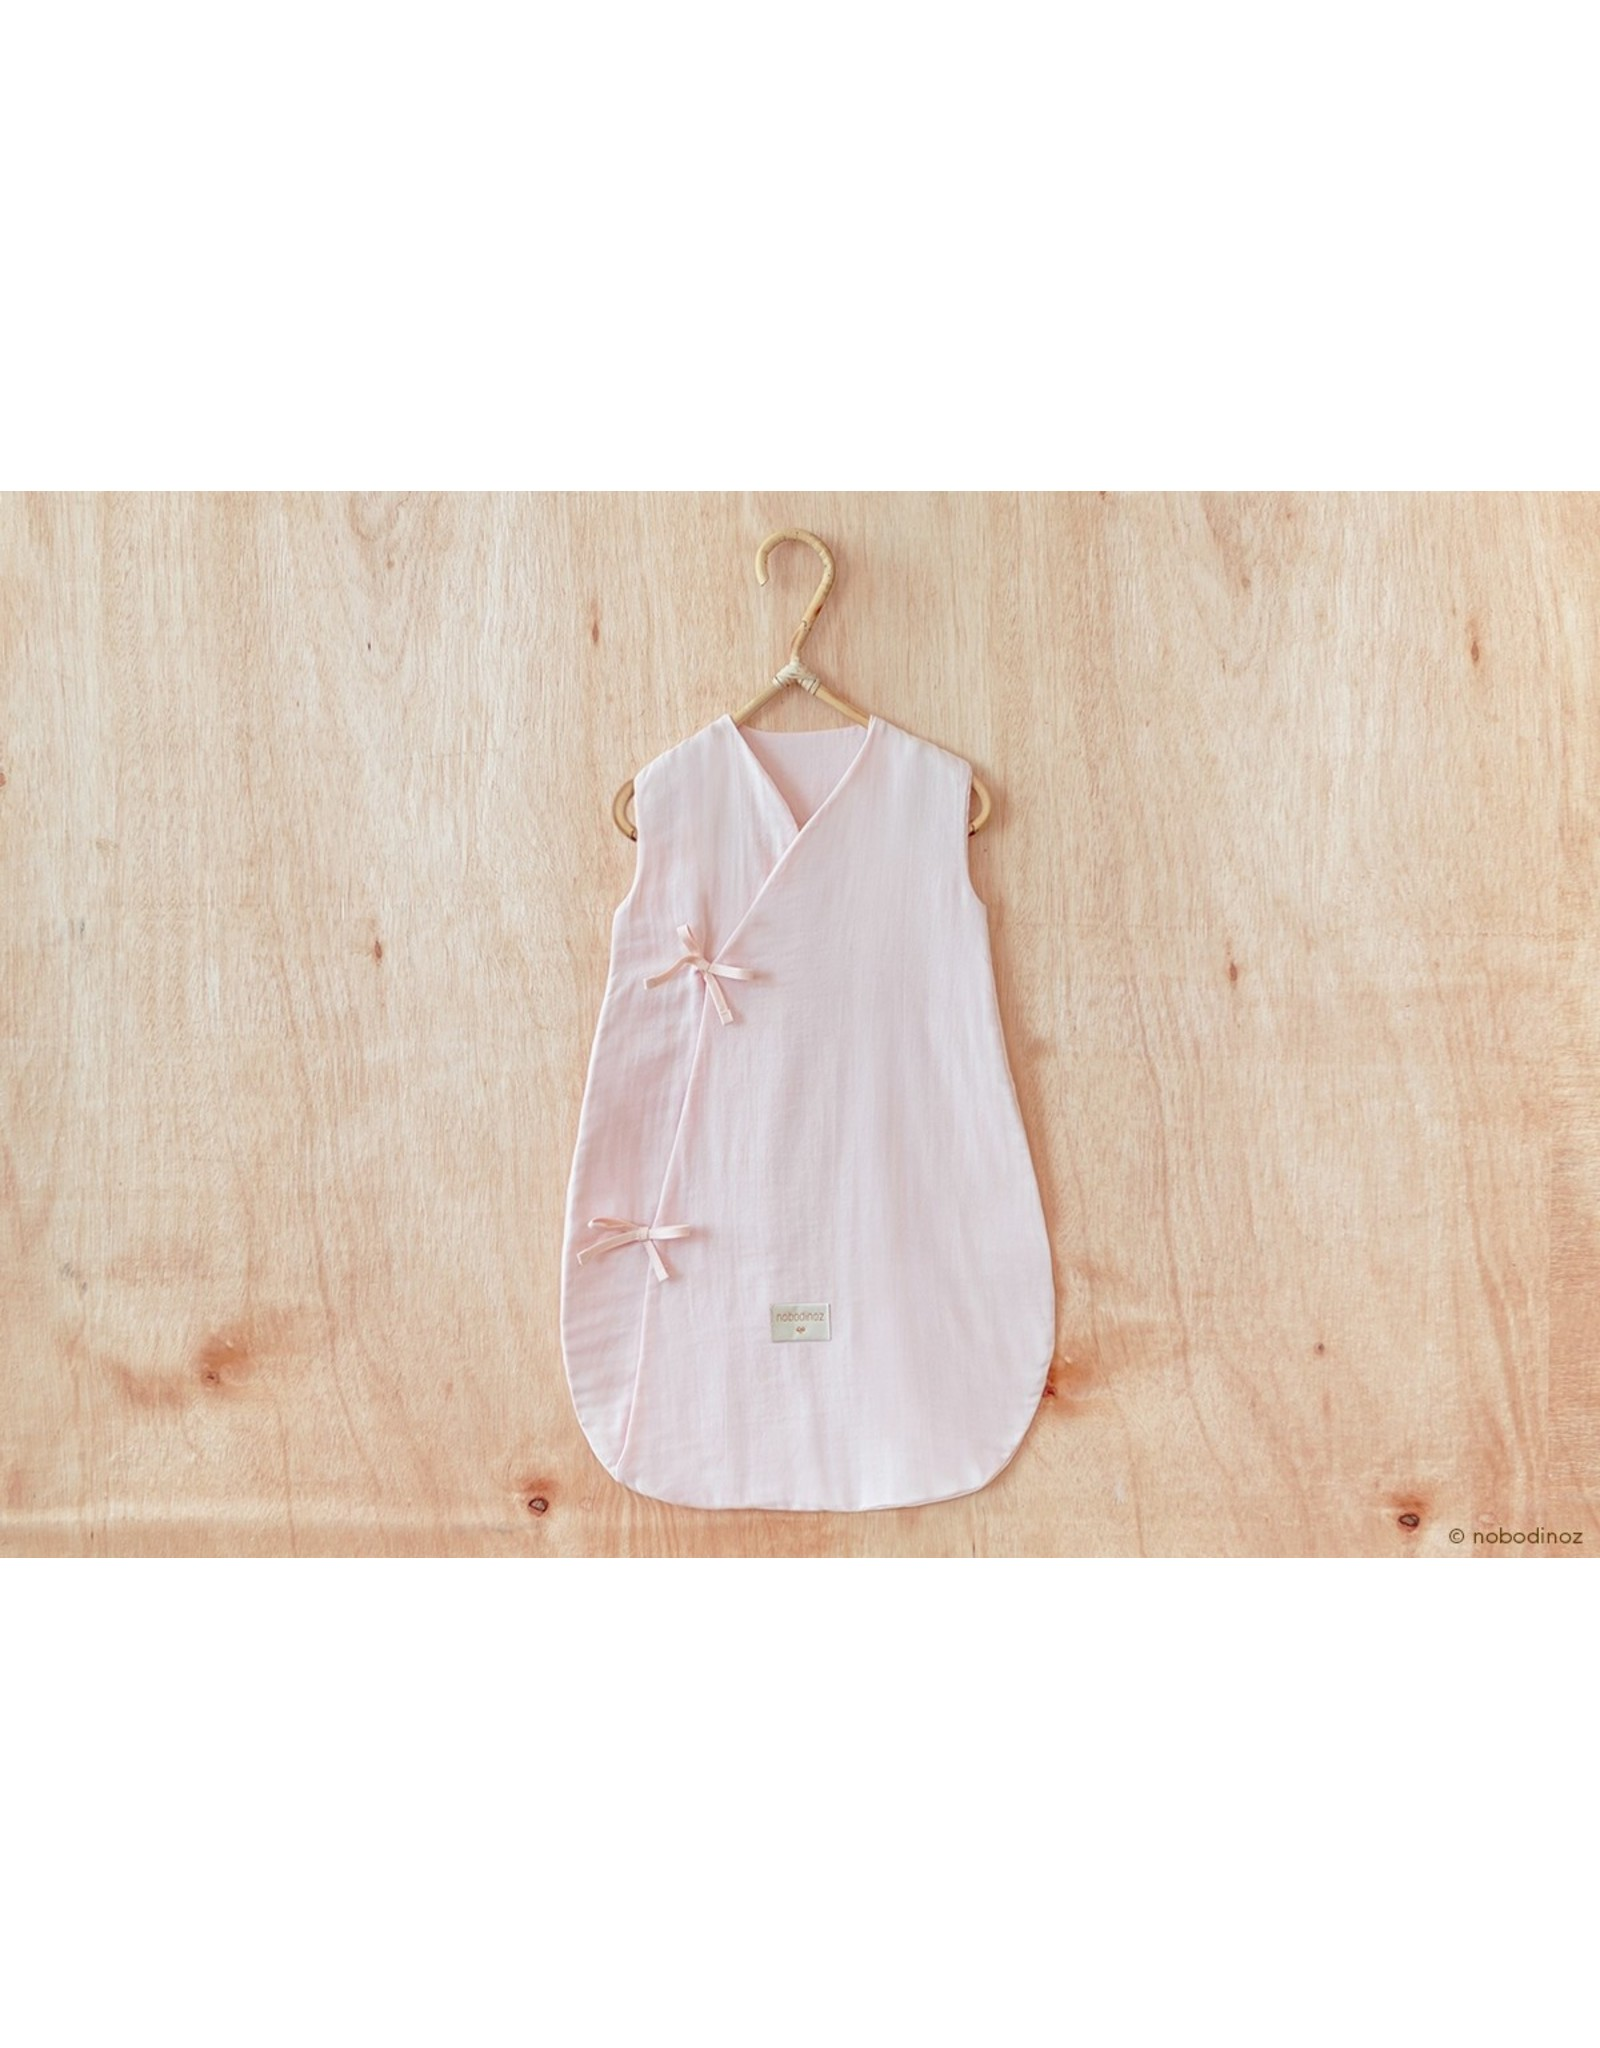 nobodinoz Gigoteuse Dreamy (été) - Dream Pink - 0 - 6 mois